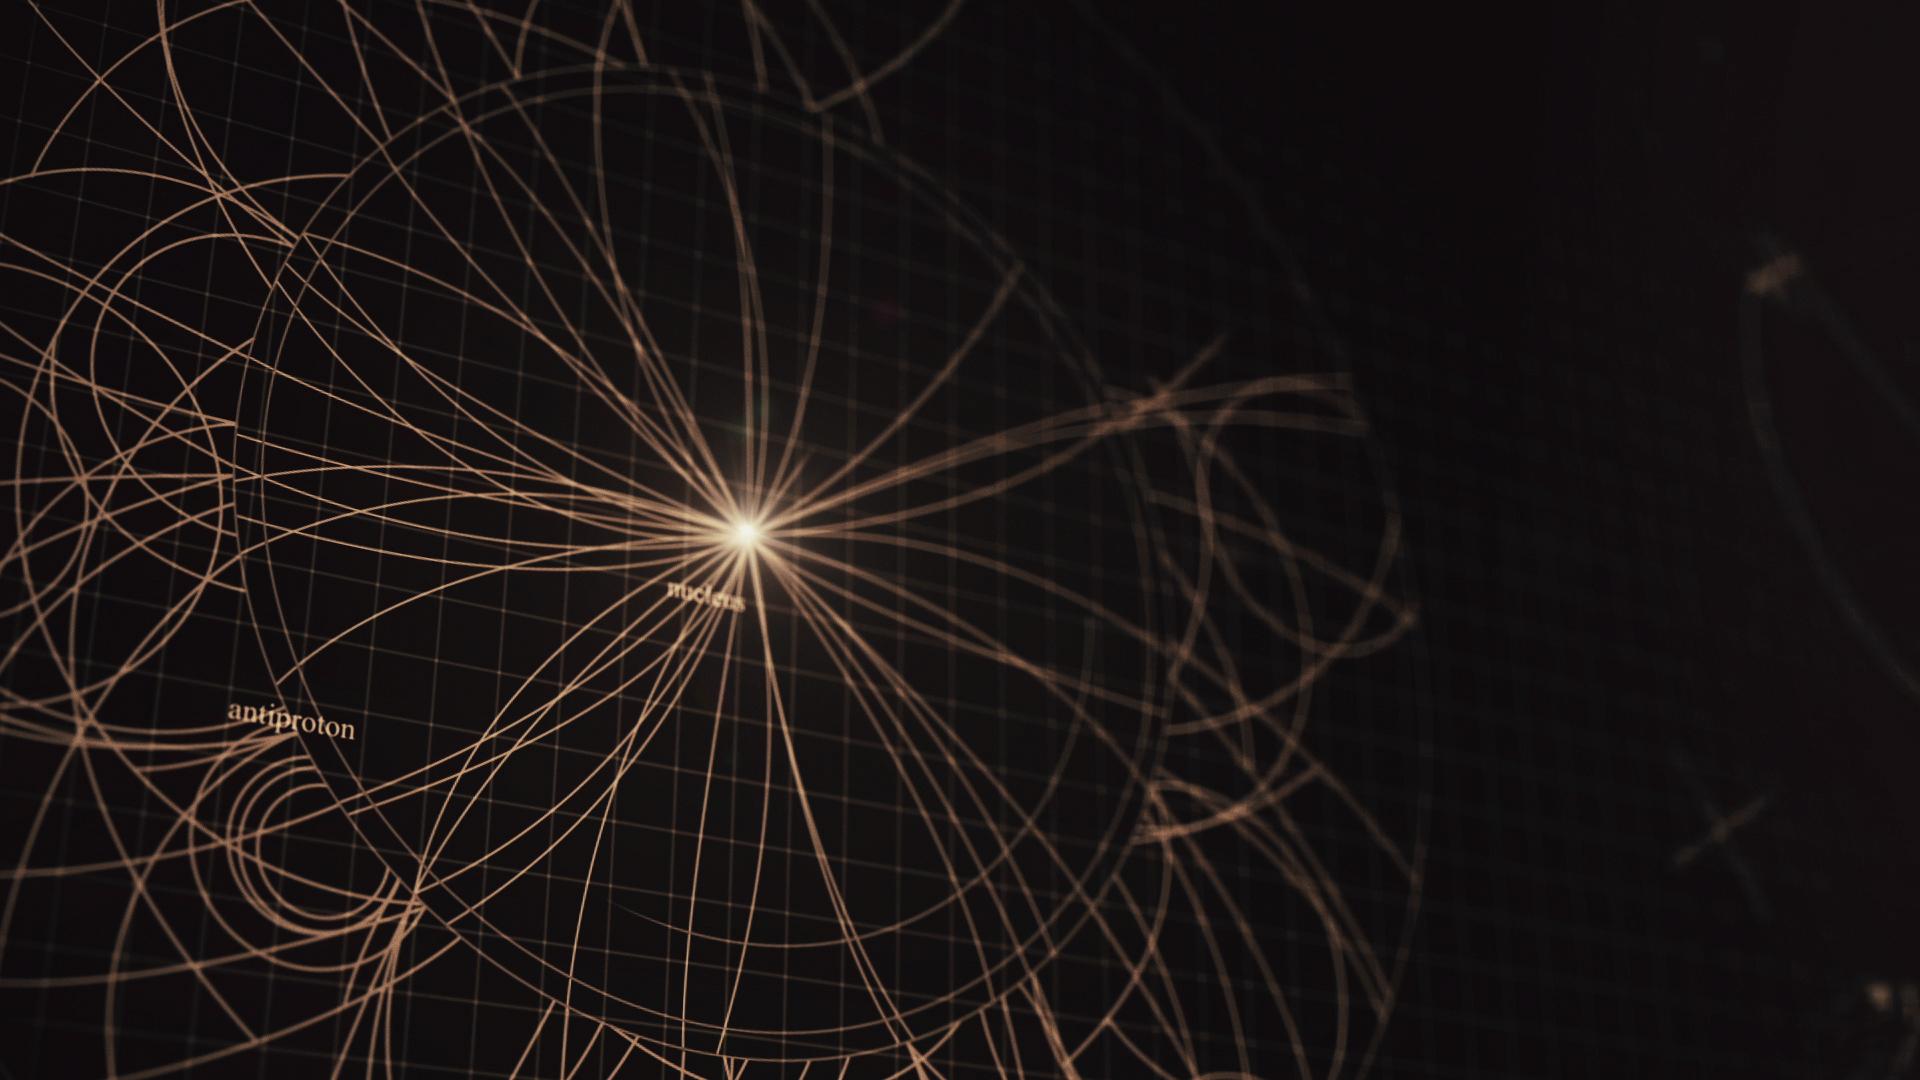 quantum_05_v01_jpgm.jpg